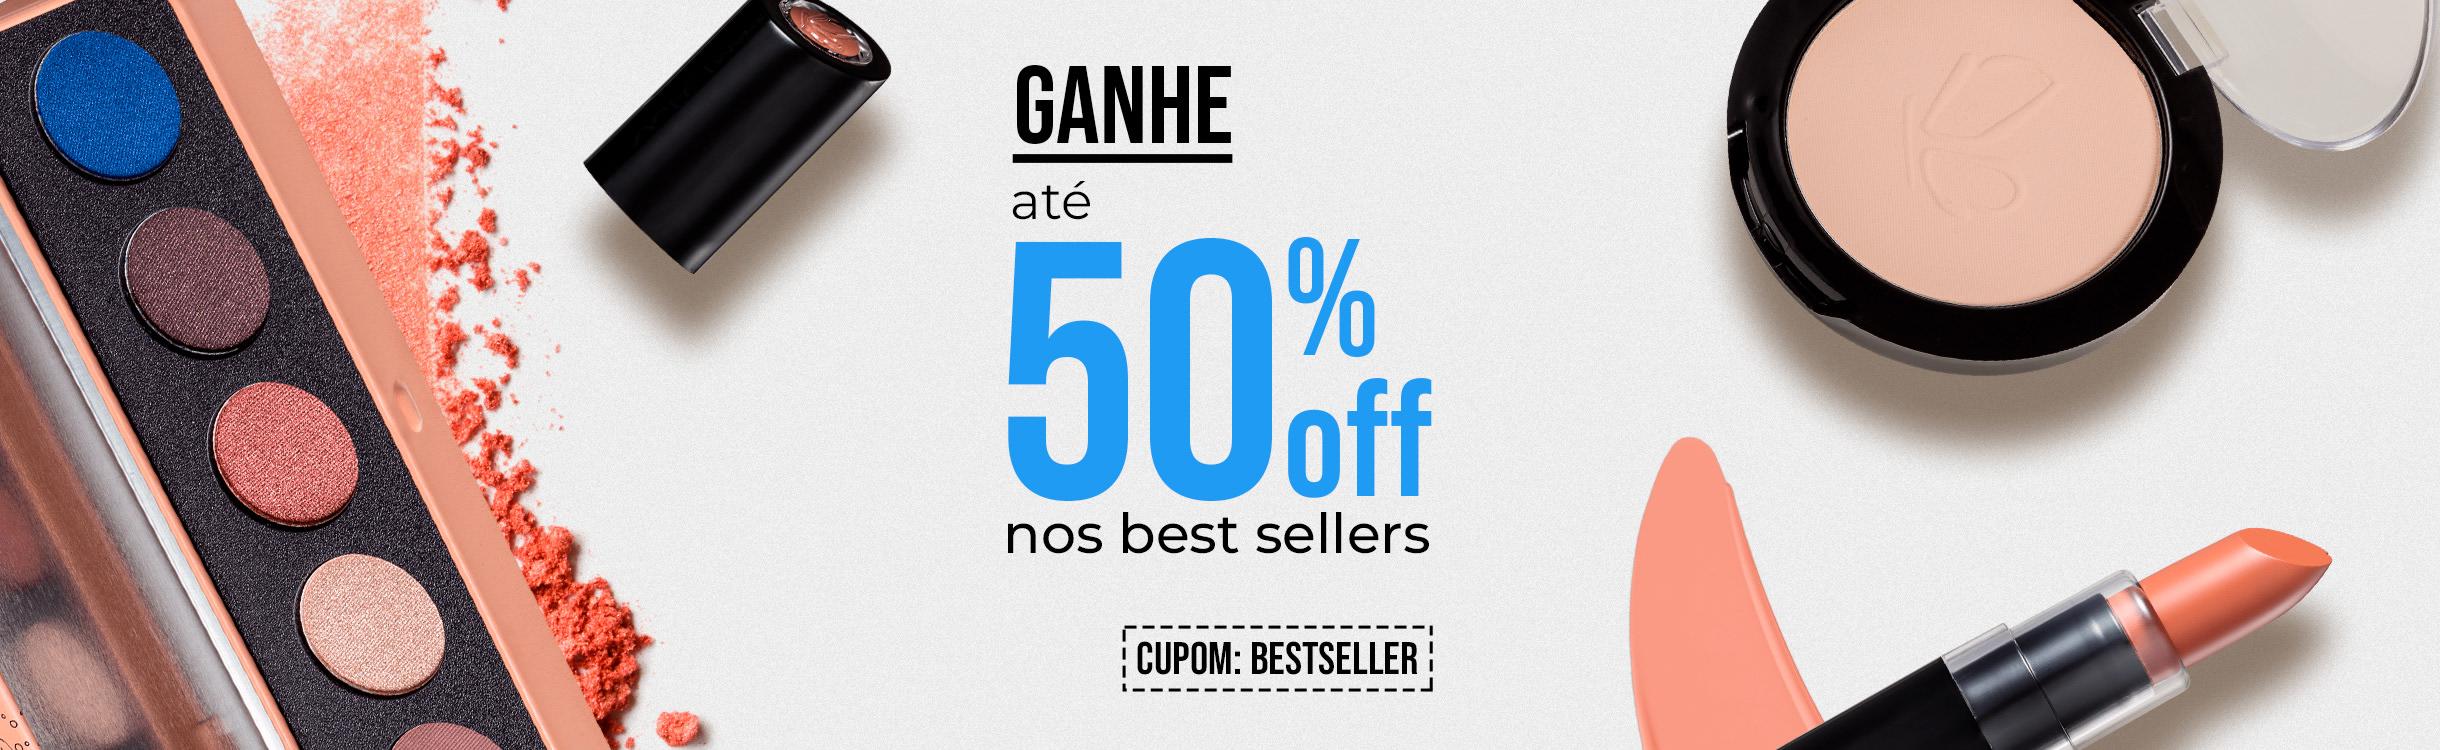 Exclusivo: Ganhe até 50%Off Extra nos Best Sellers